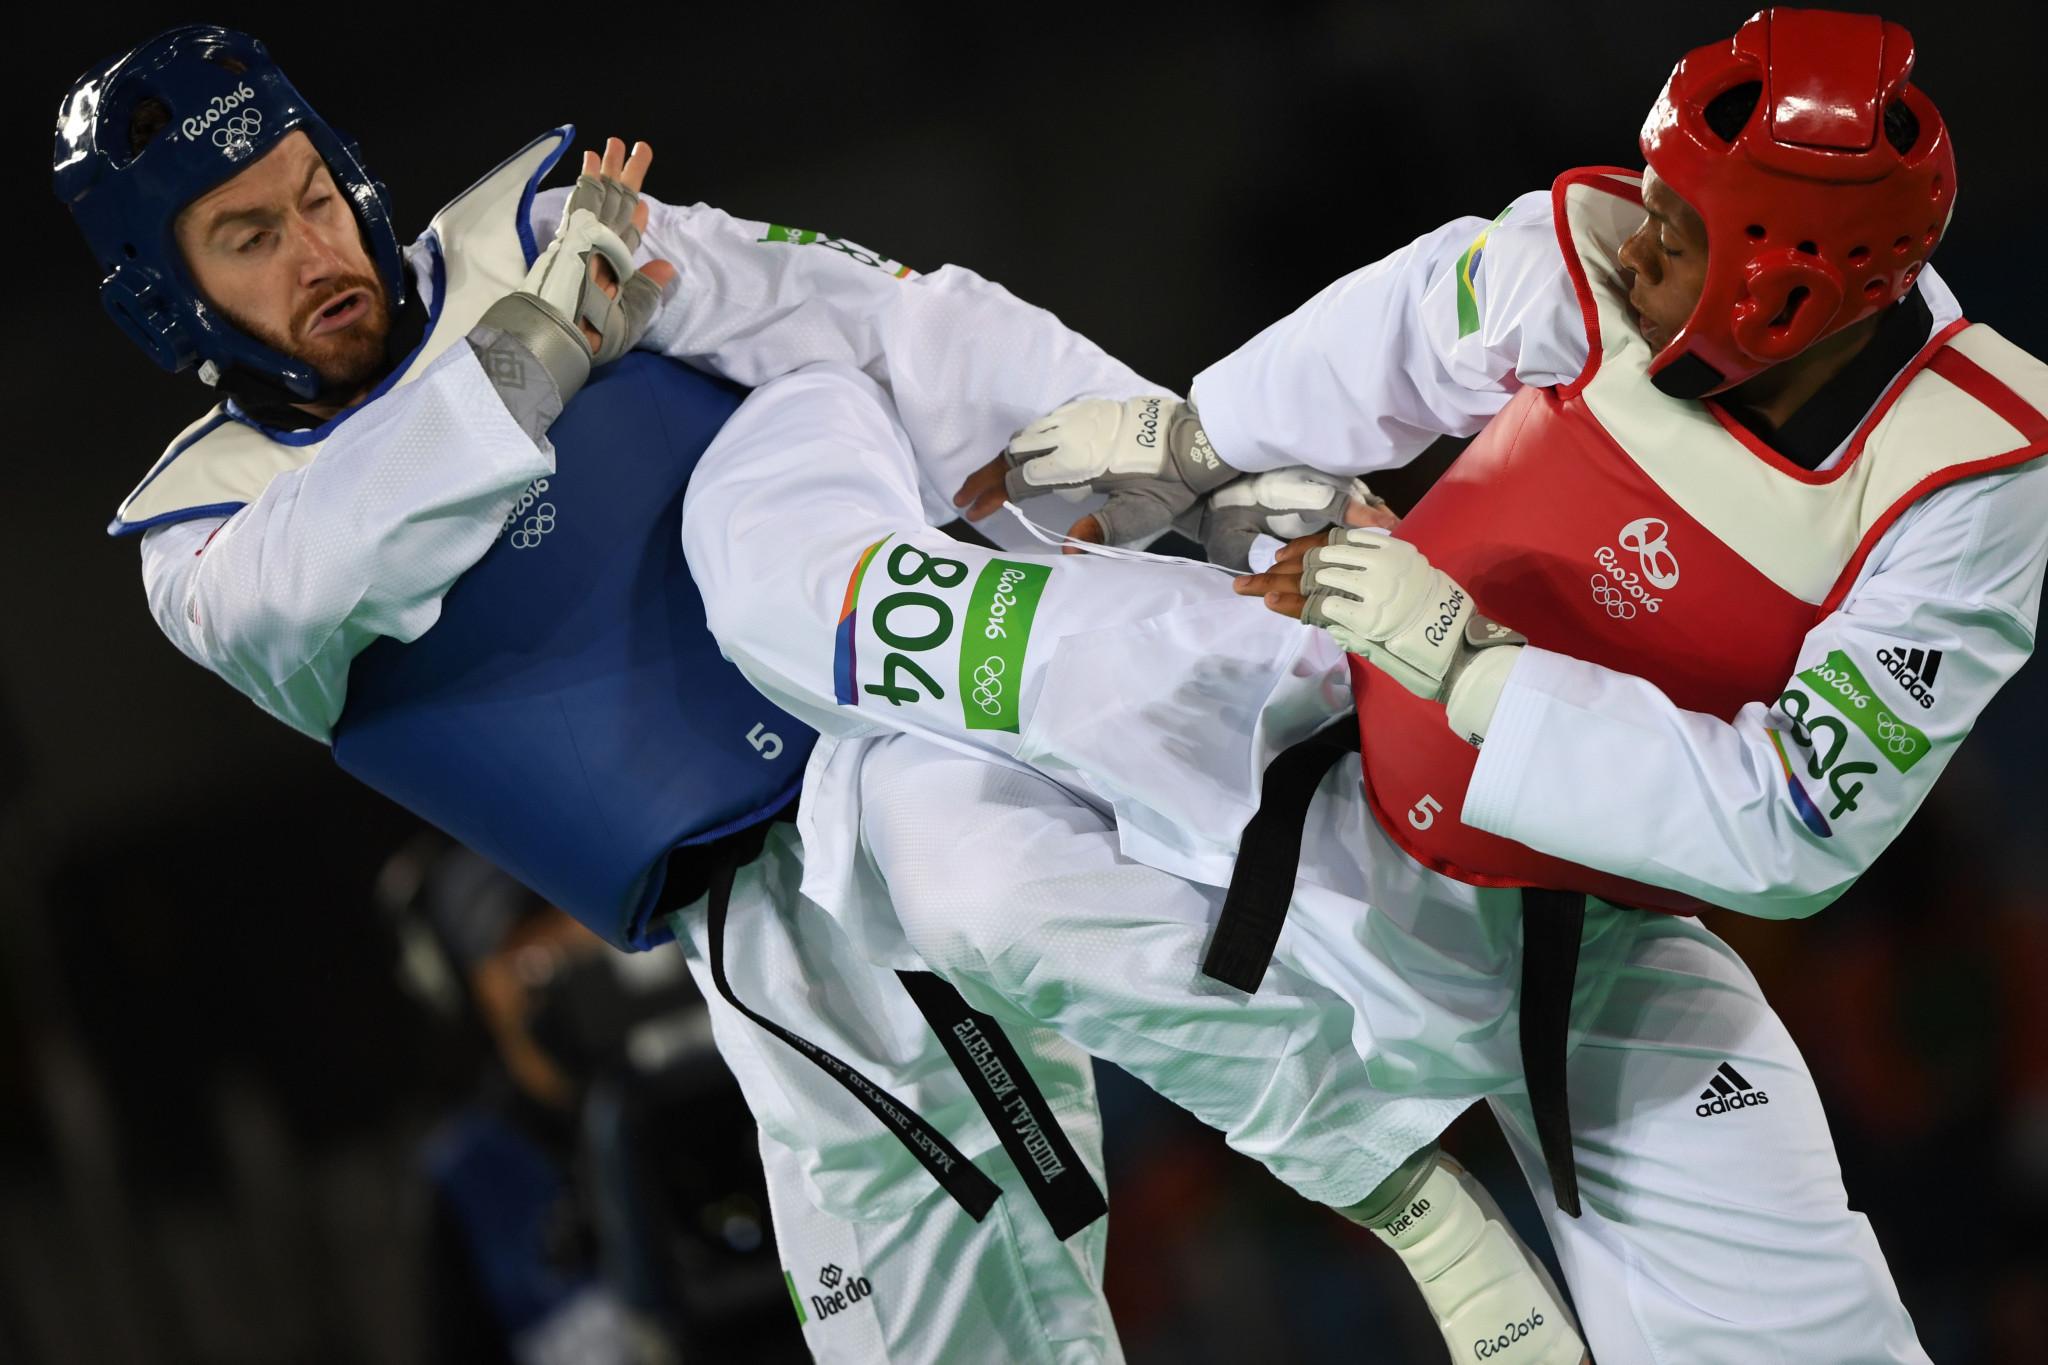 Eleven candidates running for World Taekwondo Athletes' Committee